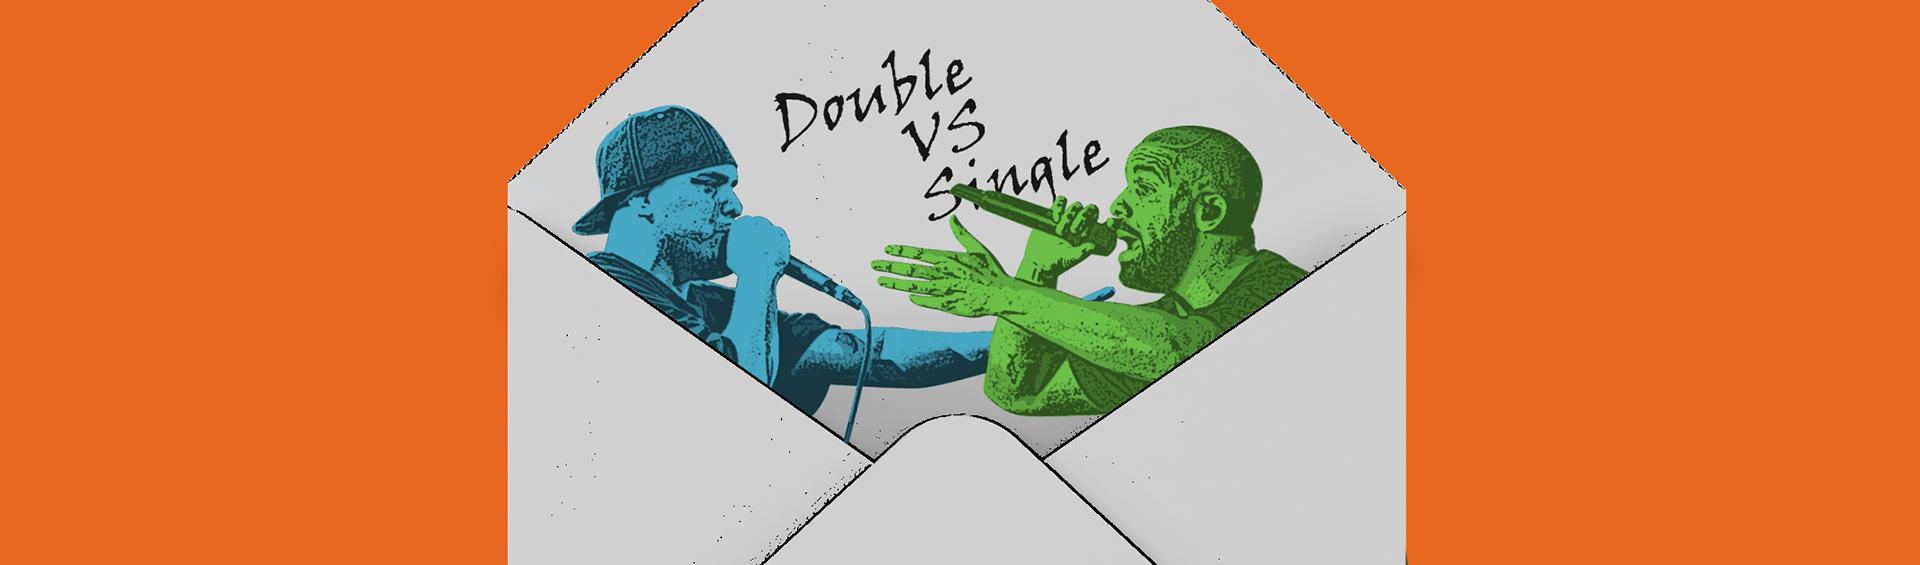 Double Opt-In vs Single Opt-In